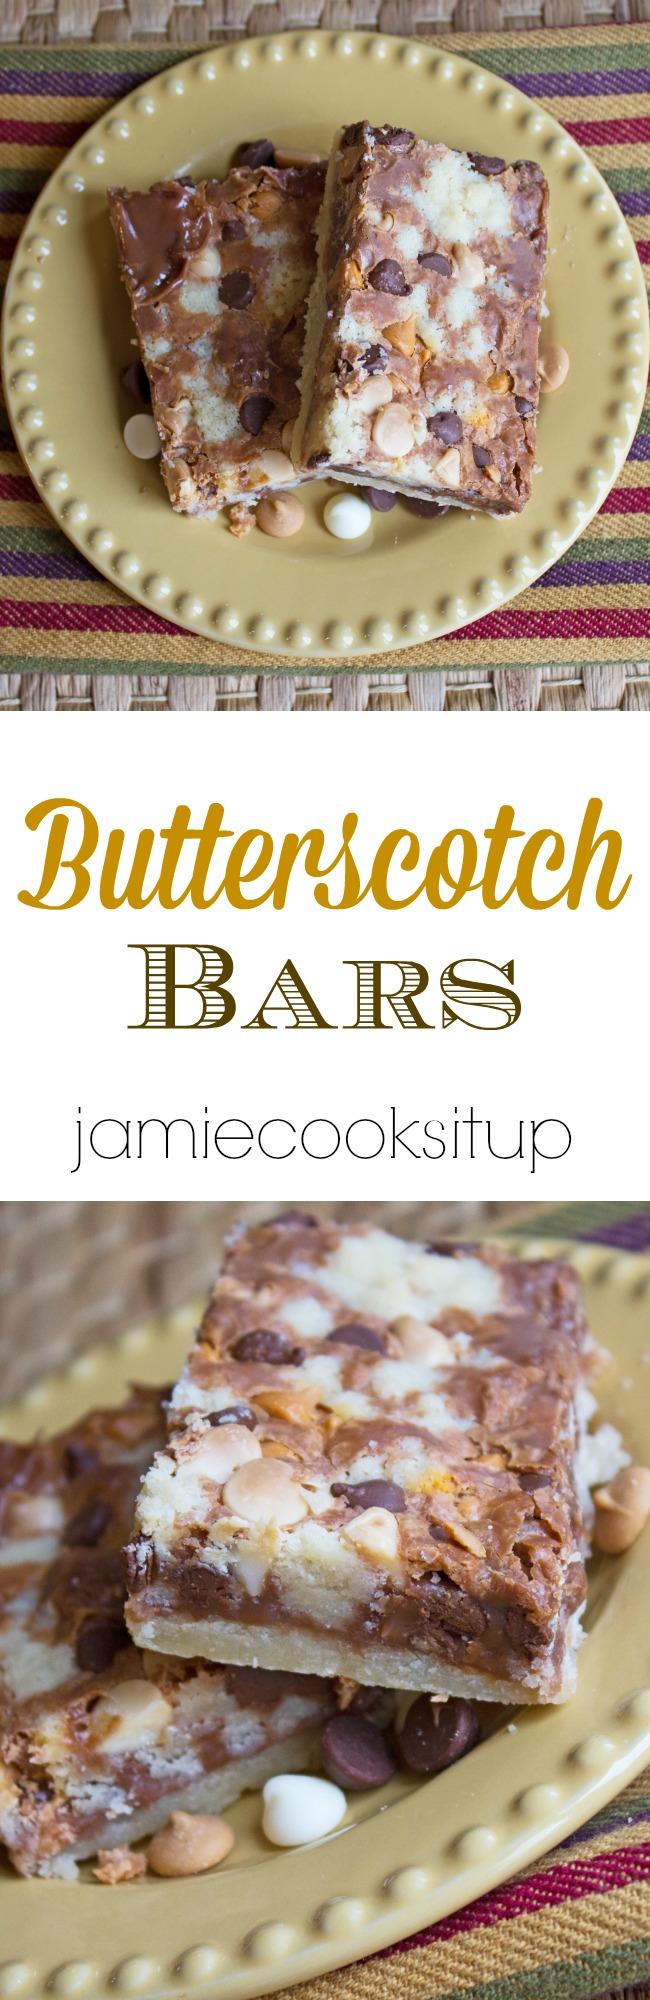 Butterscotch Bars Jamie Cooks It Up!